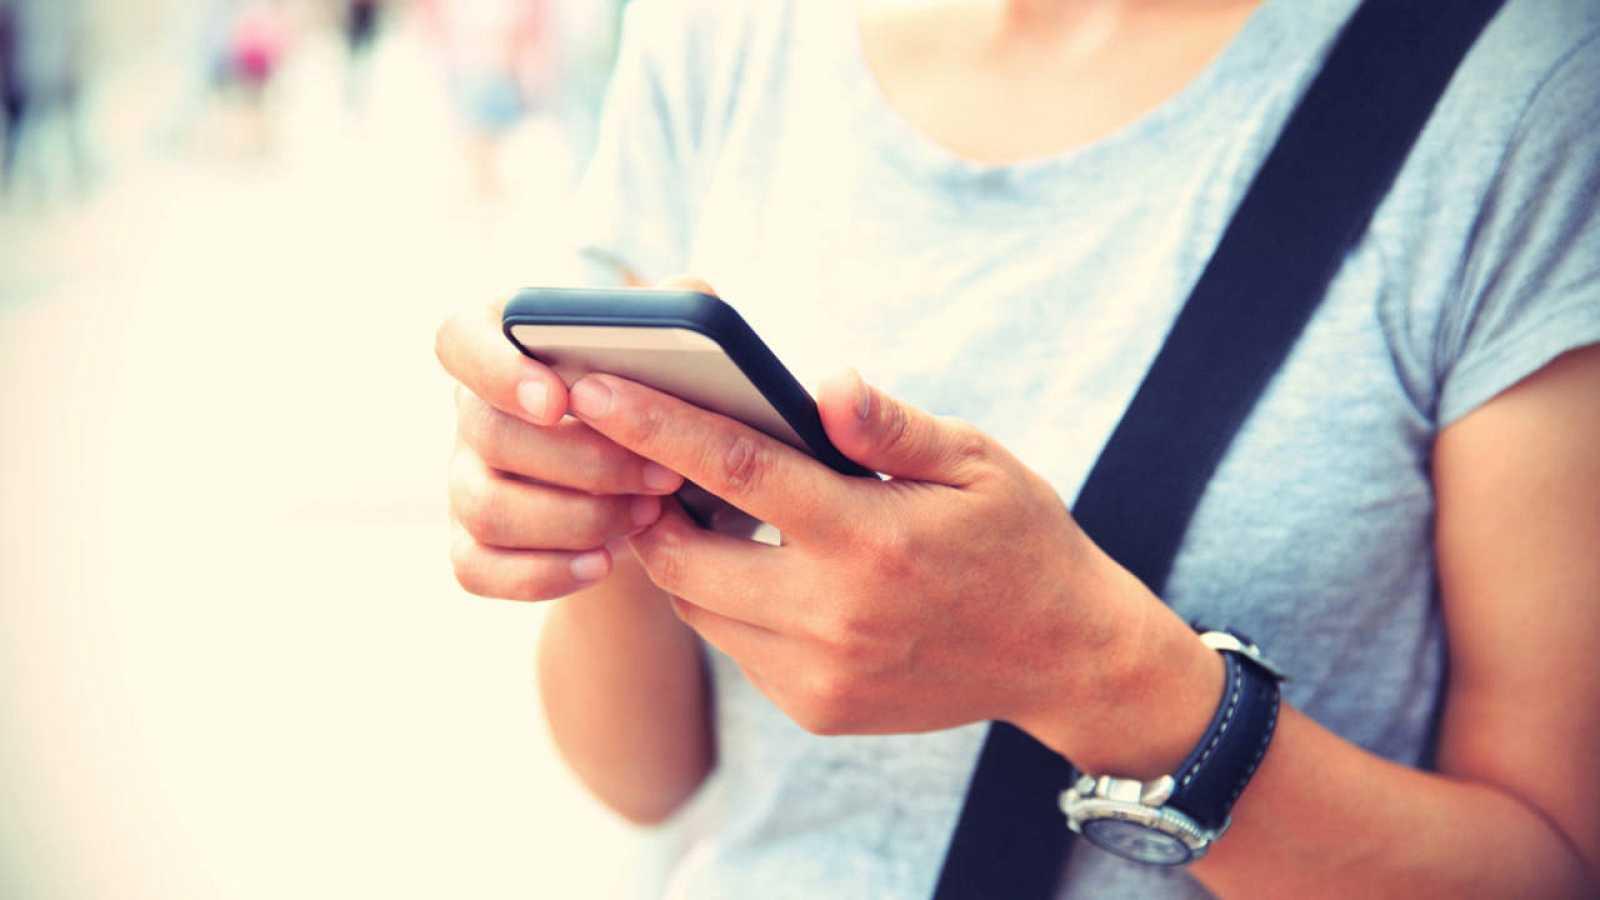 Una mujer usa su teléfono móvil